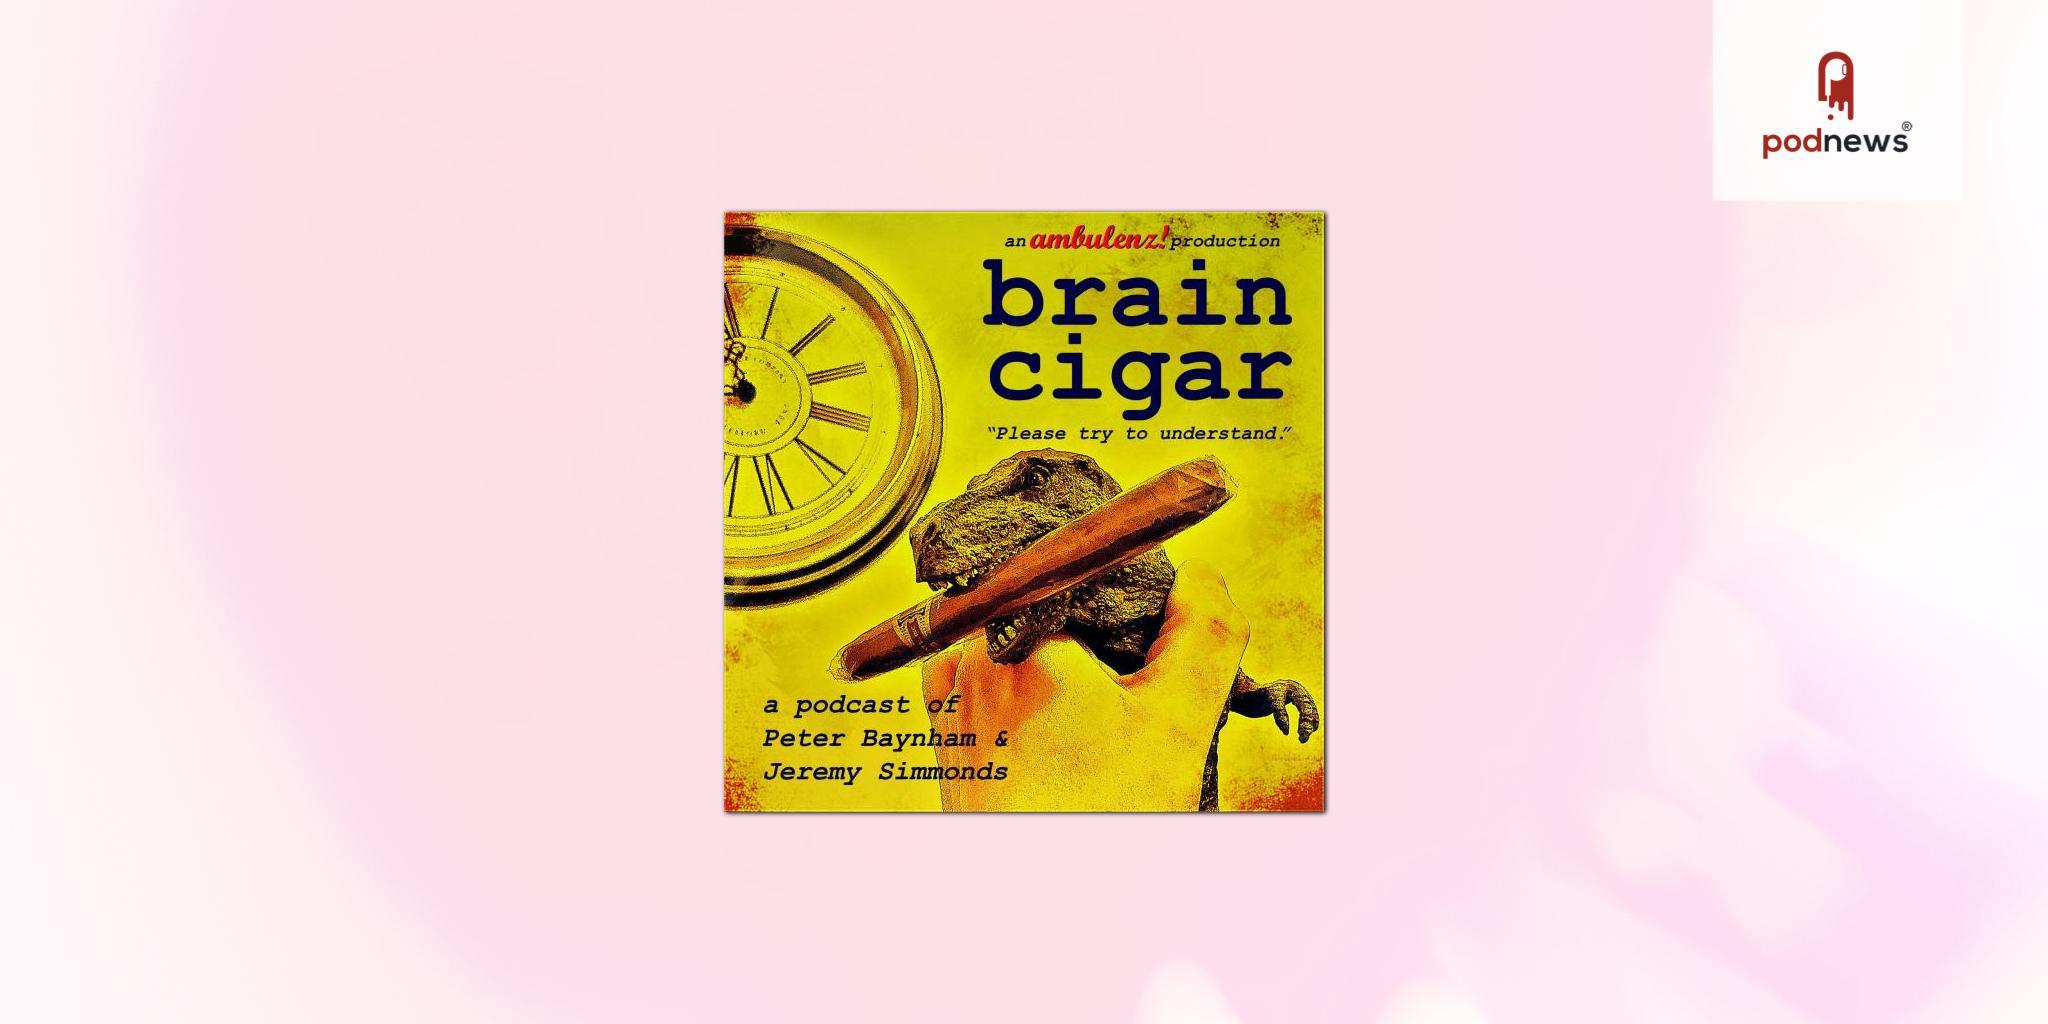 Peter Baynham and Jeremy Simmonds announce new six-part podcast series: Brain Cigar